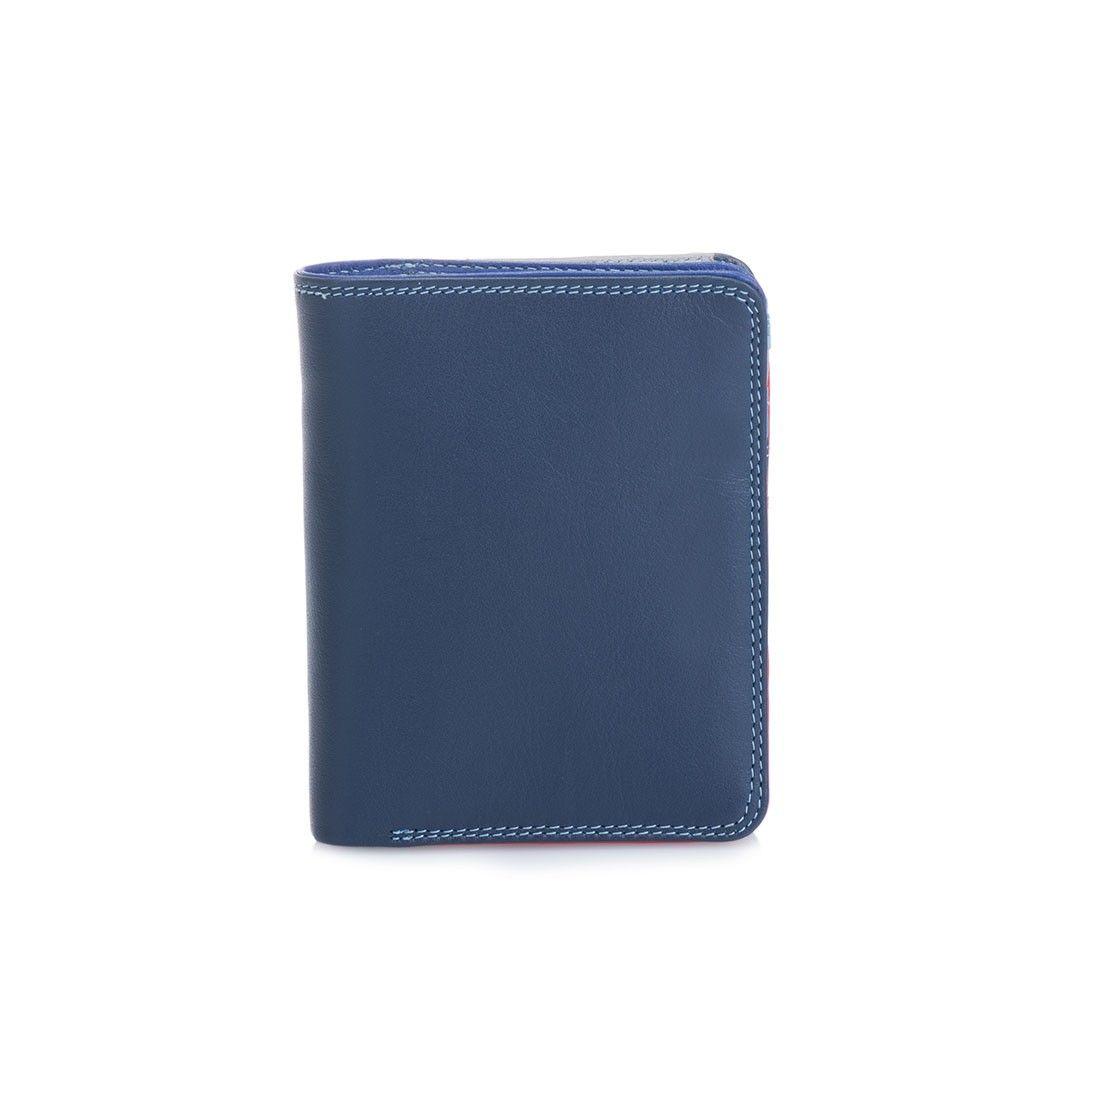 Billetera de Cremallera Mediana - Mywalit - 10